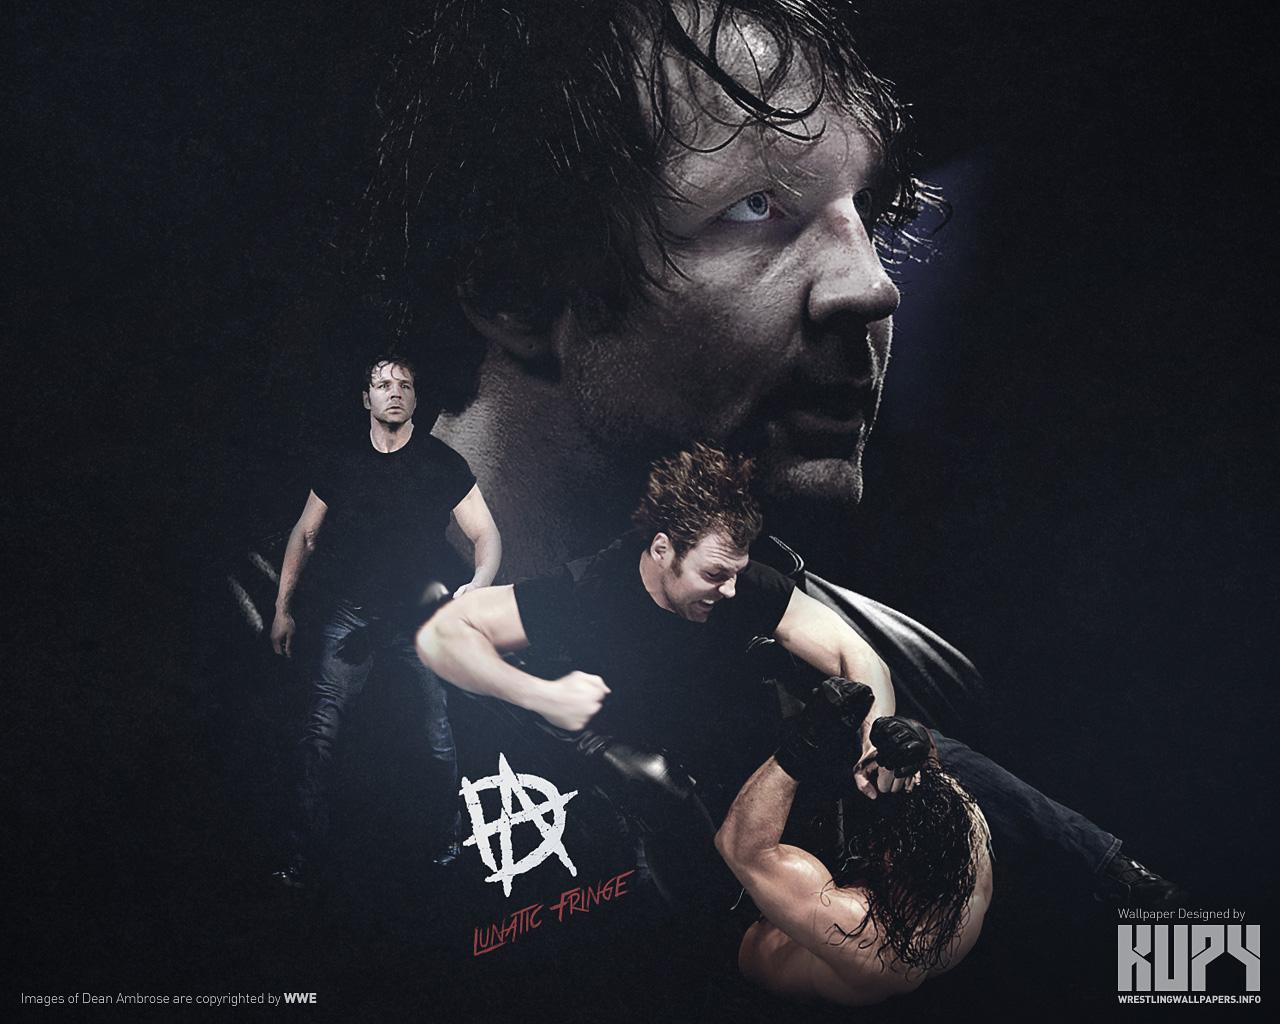 Shield Aftermath: Dean Ambrose